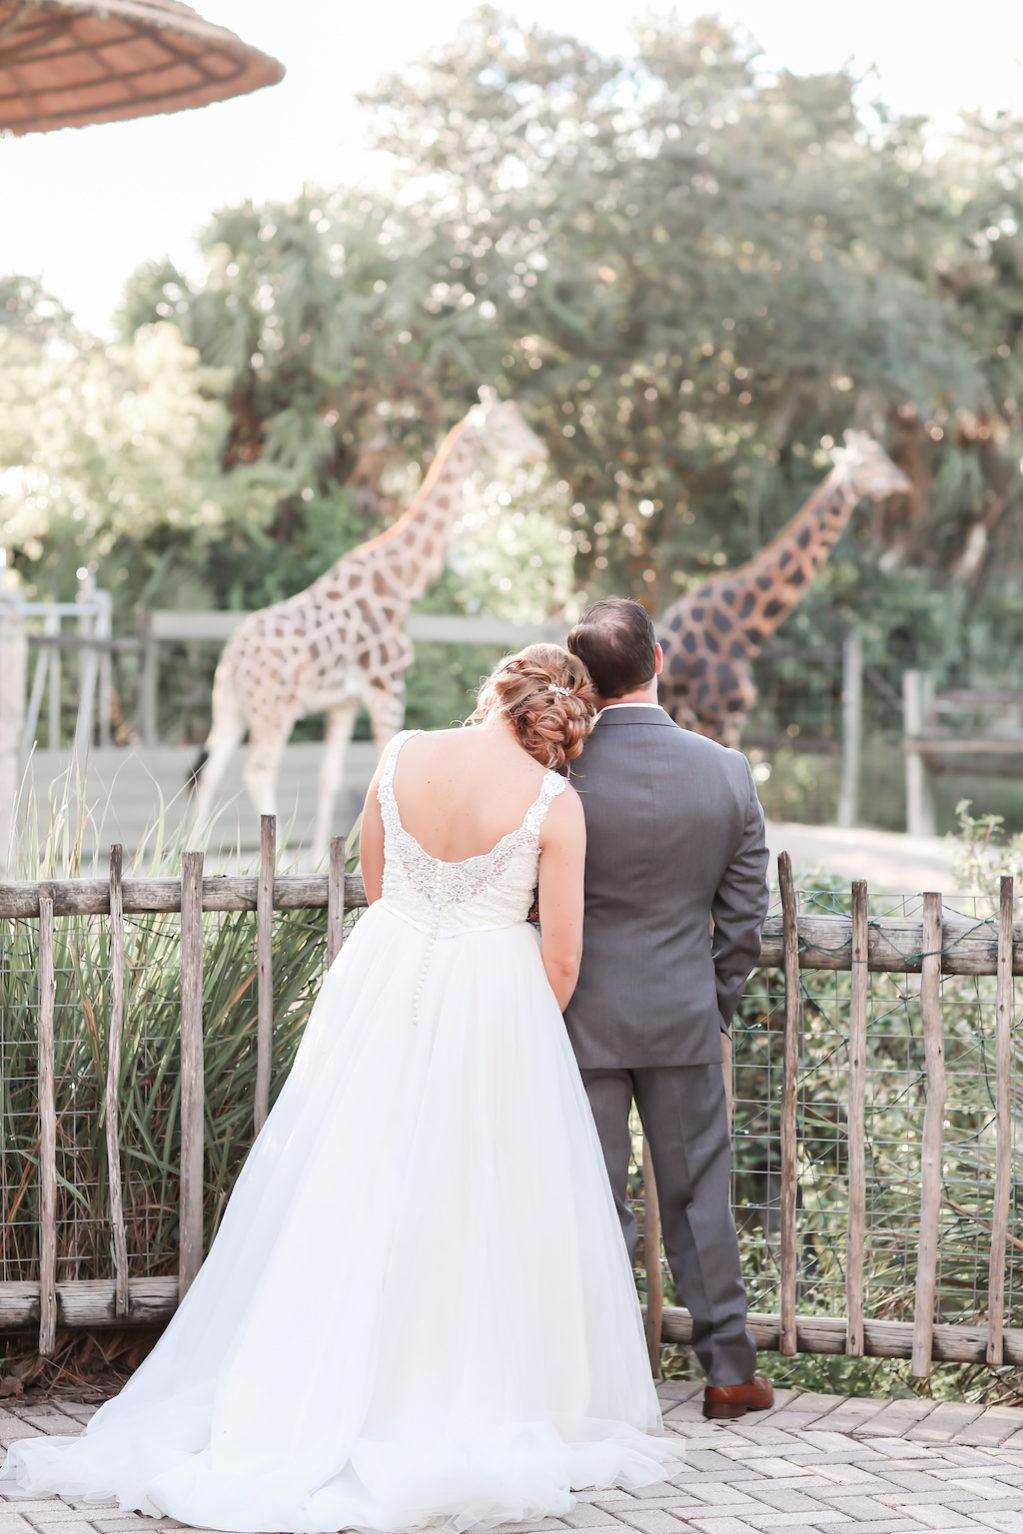 Florida Bride and Groom Outdoor Wedding Portrait | Tampa Bay Wedding Photographer Lifelong Photography Studio | Tampa Unique Wedding Venue ZooTampa at Lowry Park